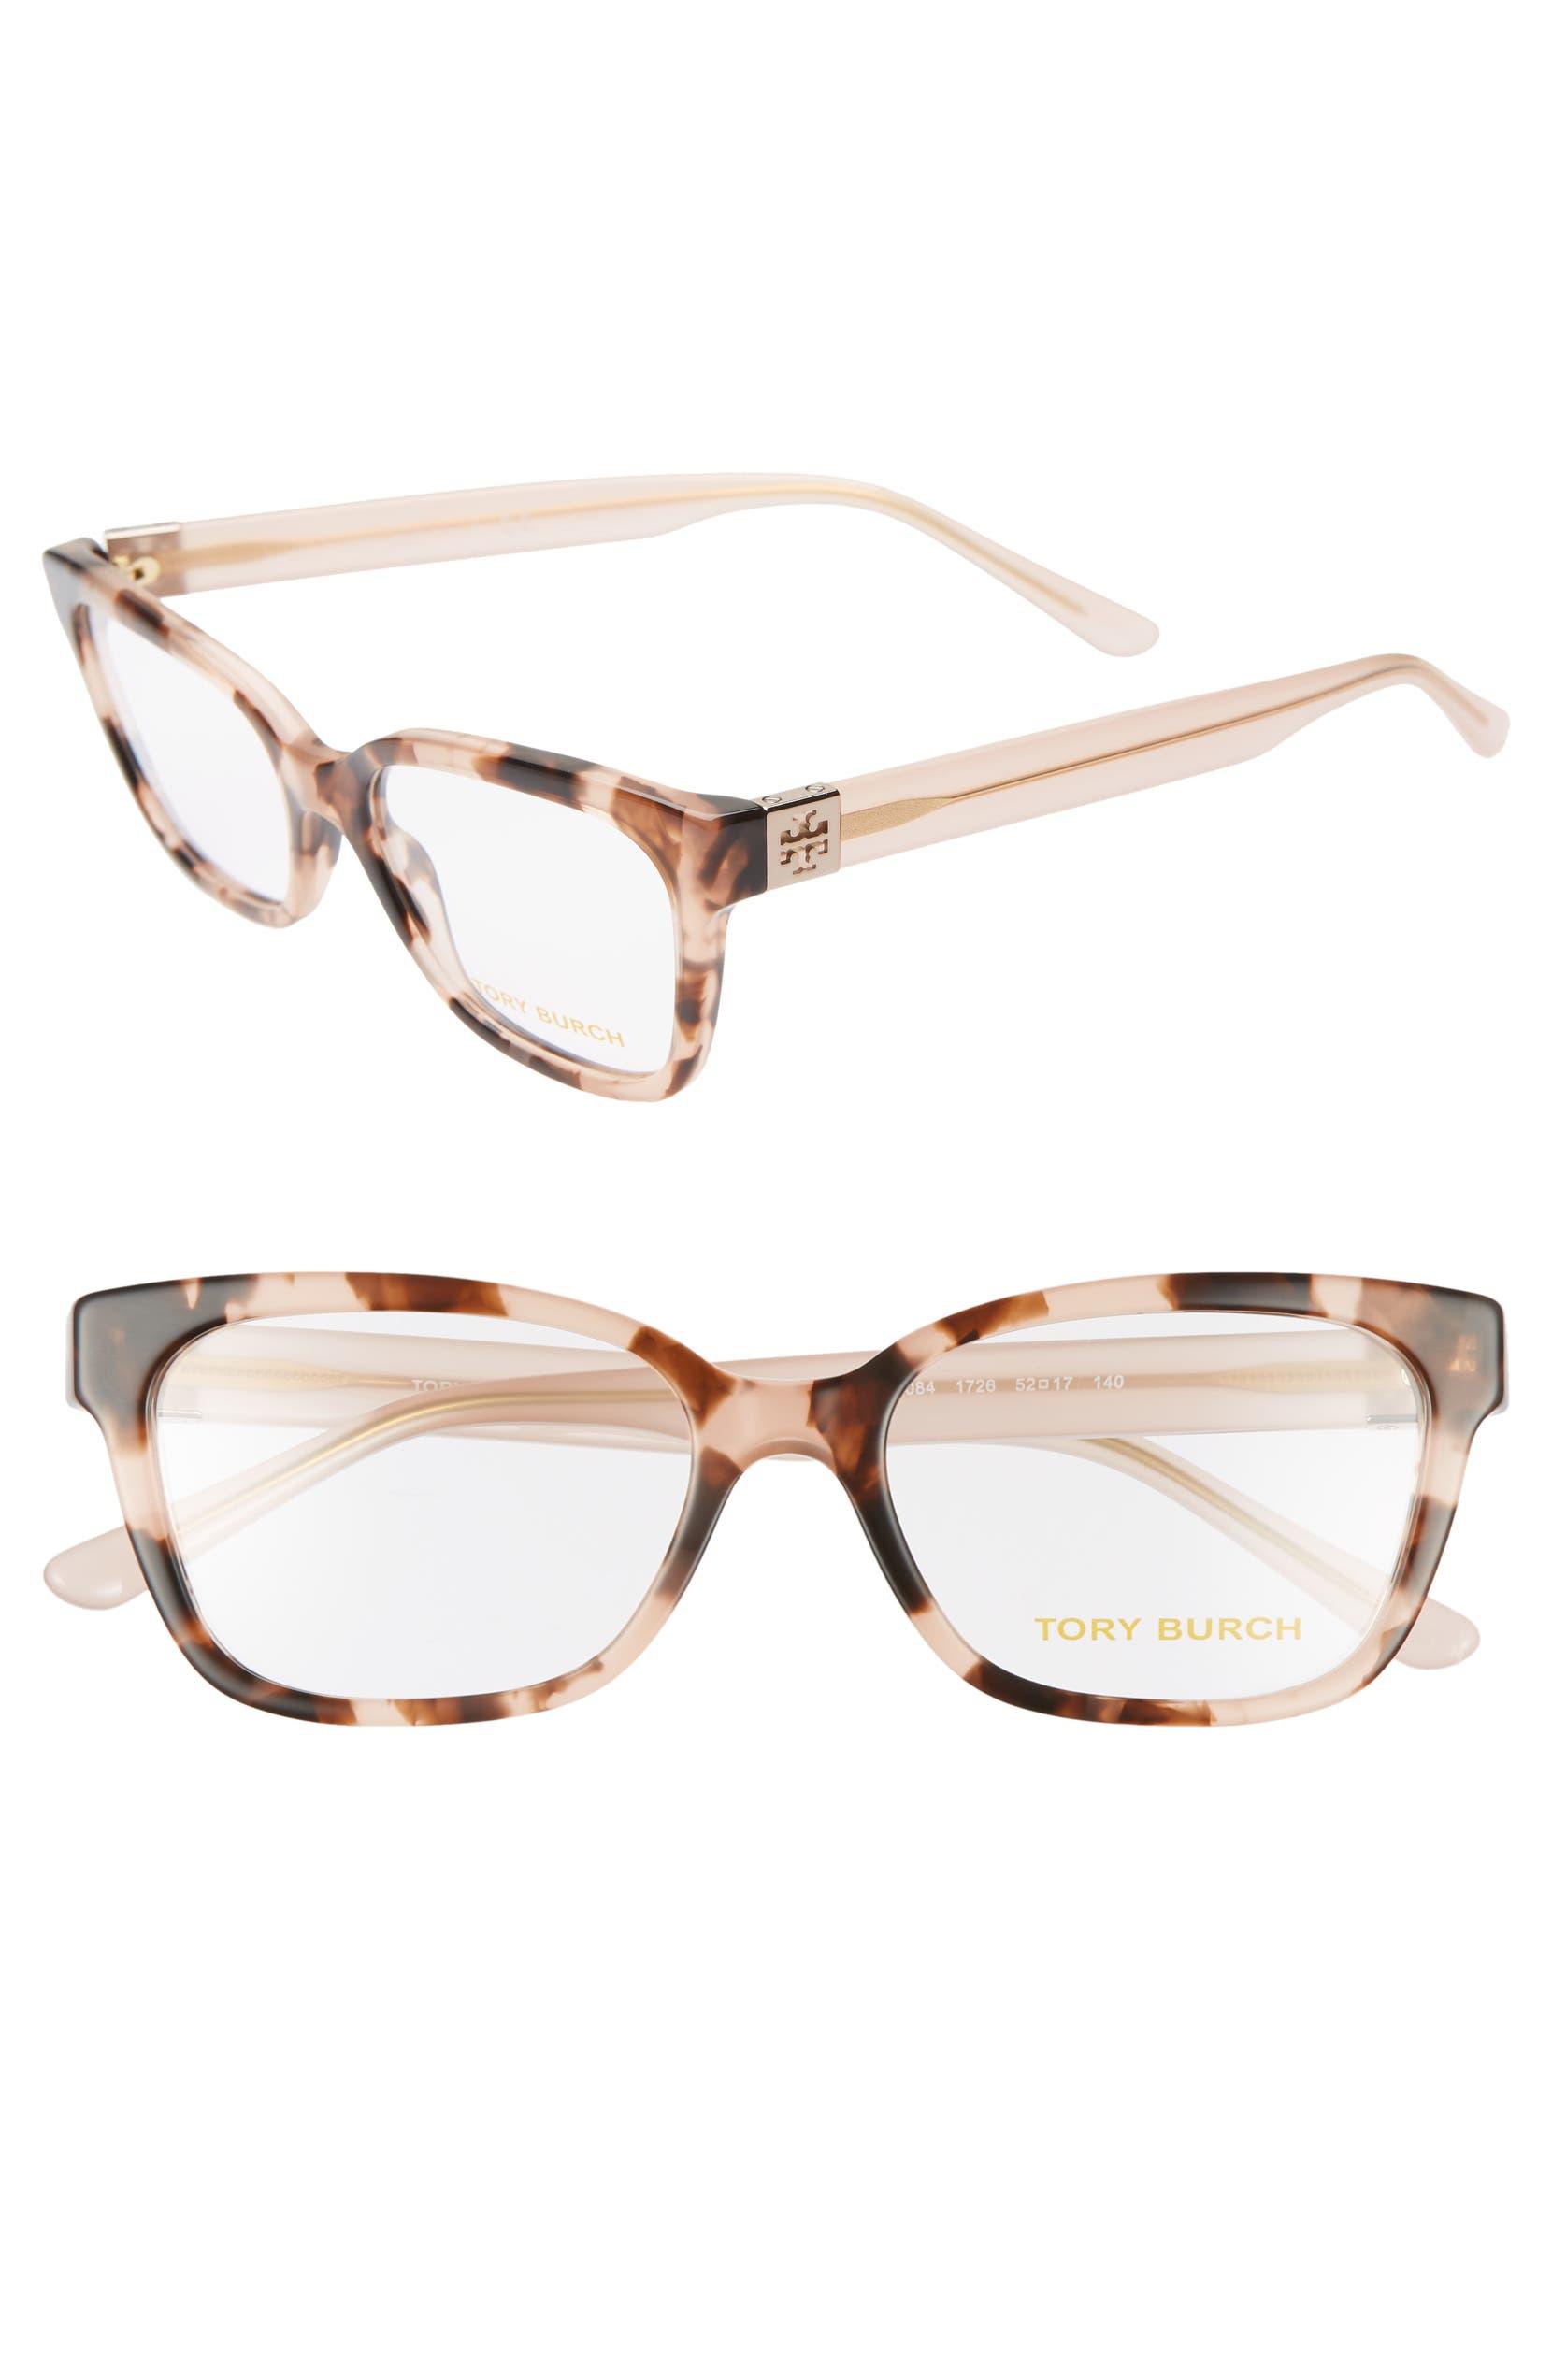 40a7378590f Tory Burch 52mm Square Optical Glasses